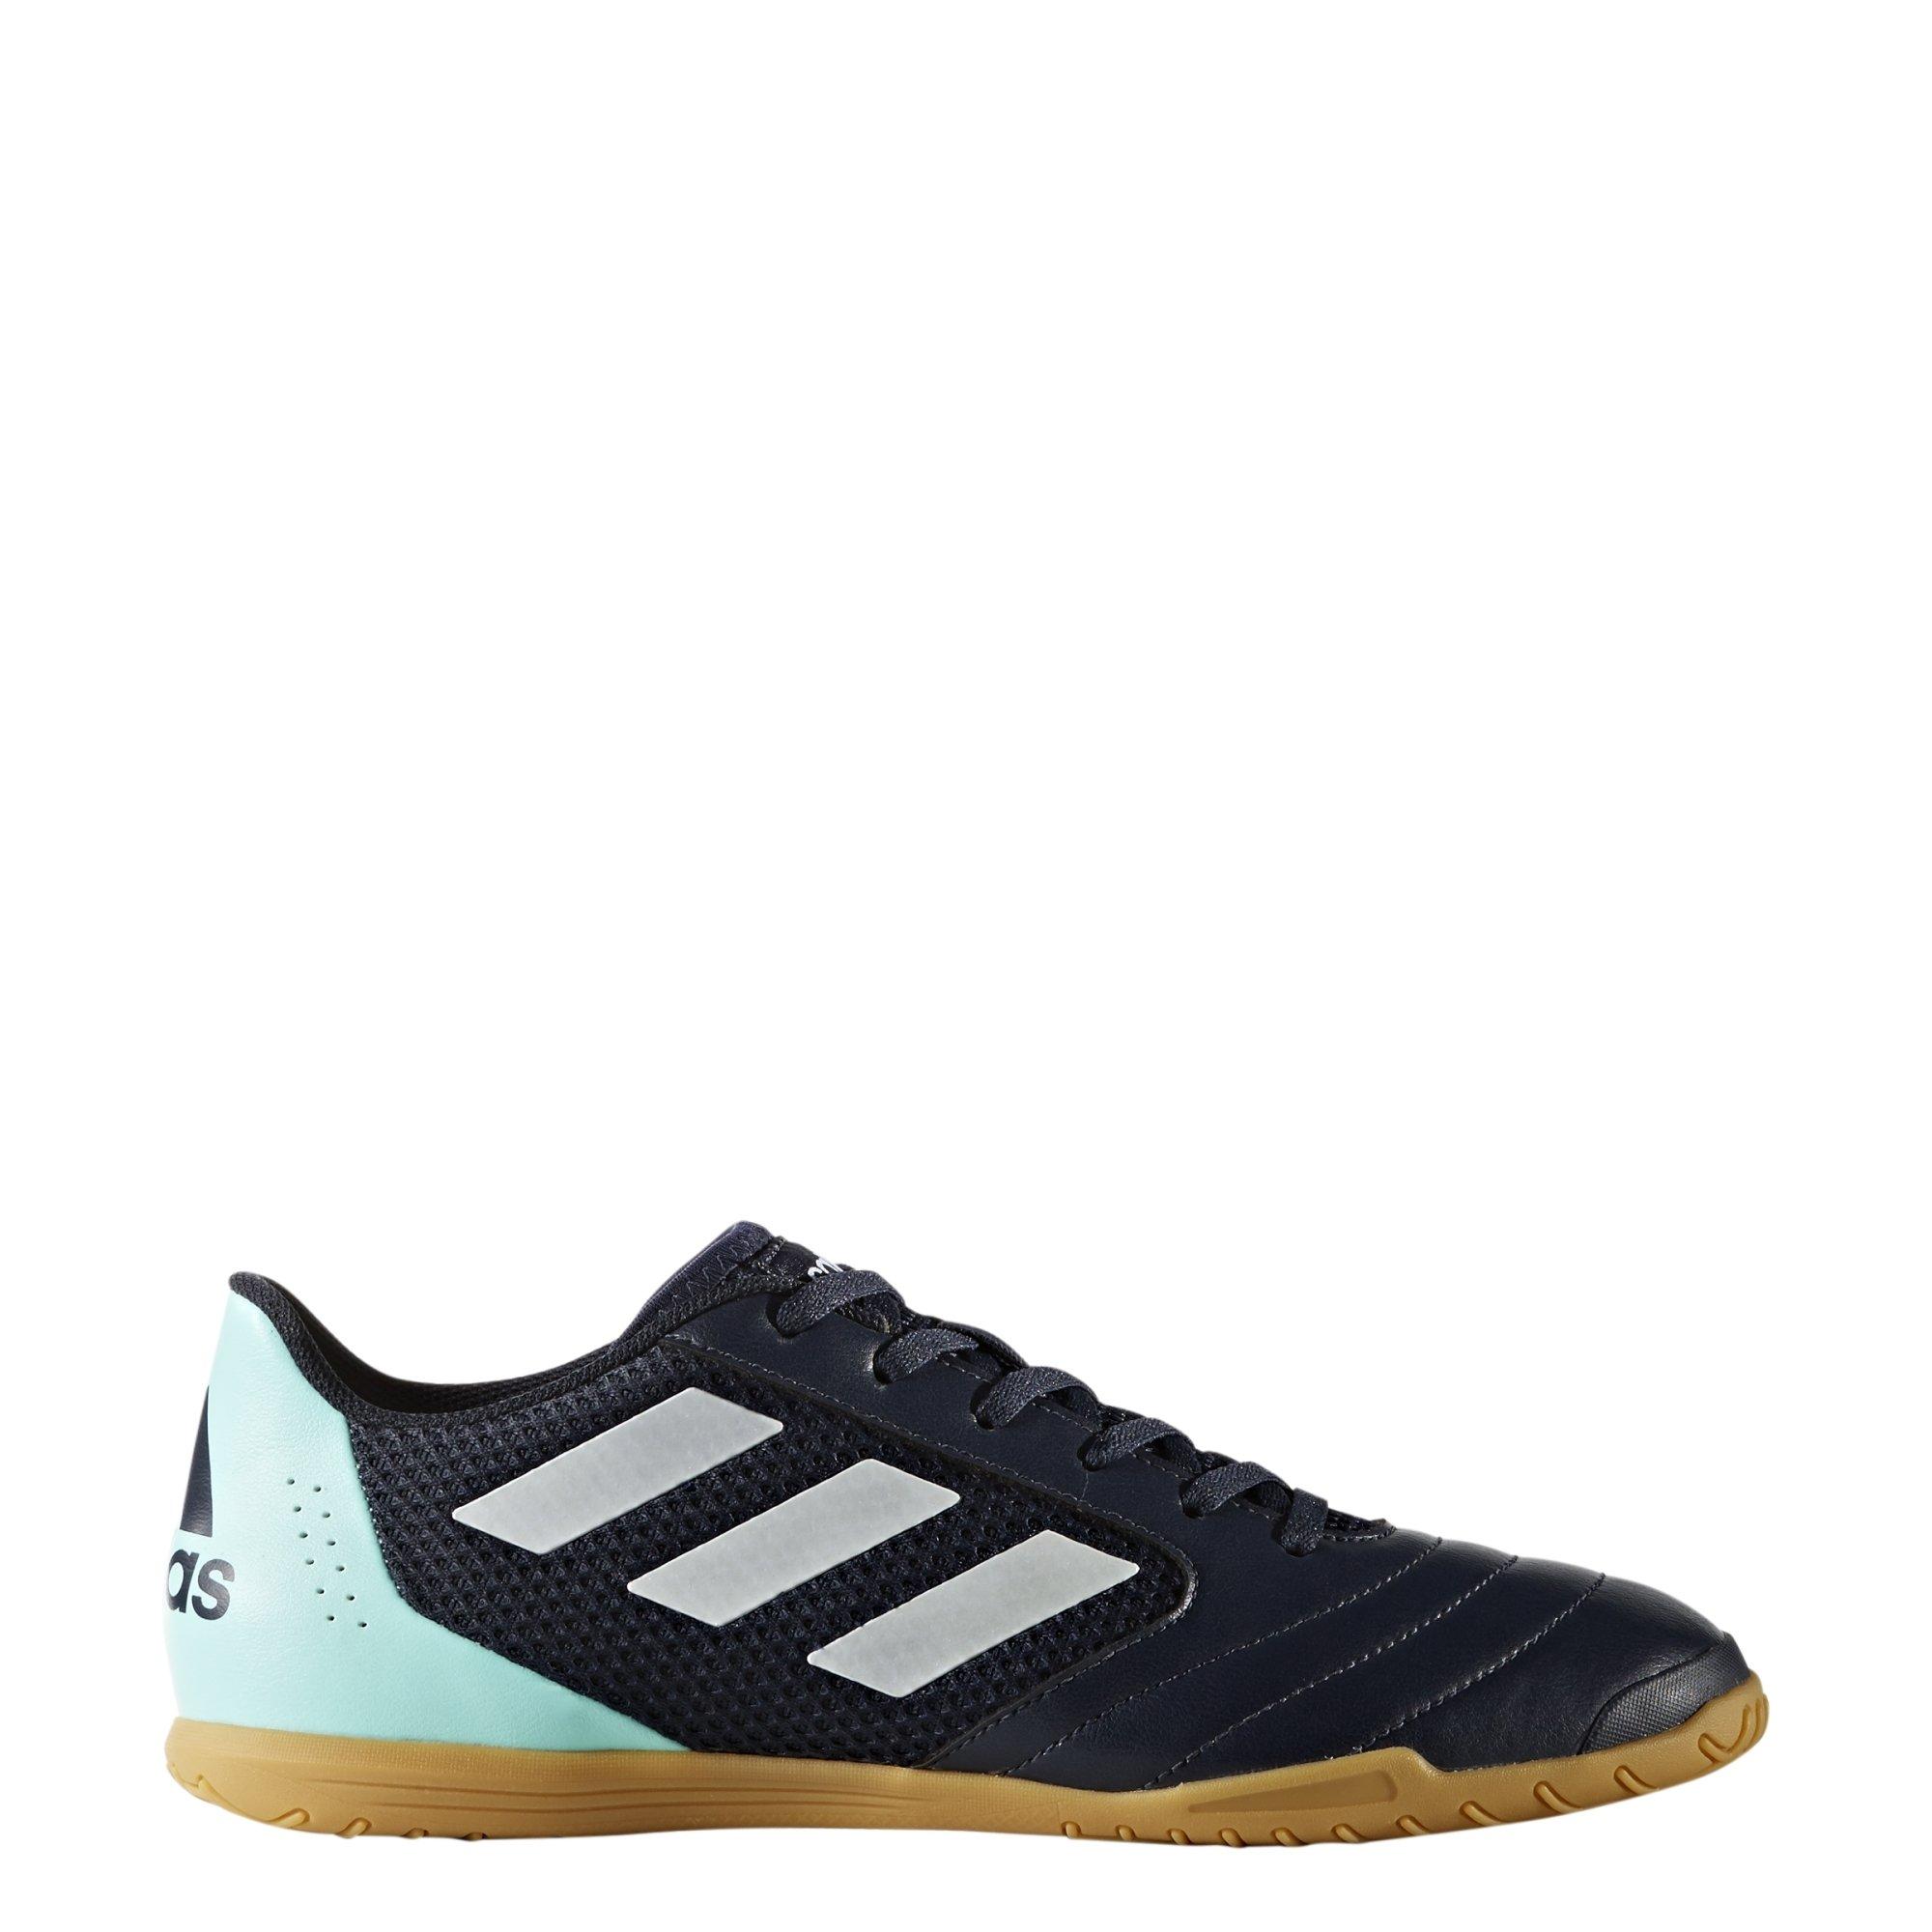 adidas Ace 17.4, Zapatillas de fútbol Sala para Hombre, Azul (Tinley/Ftwbla